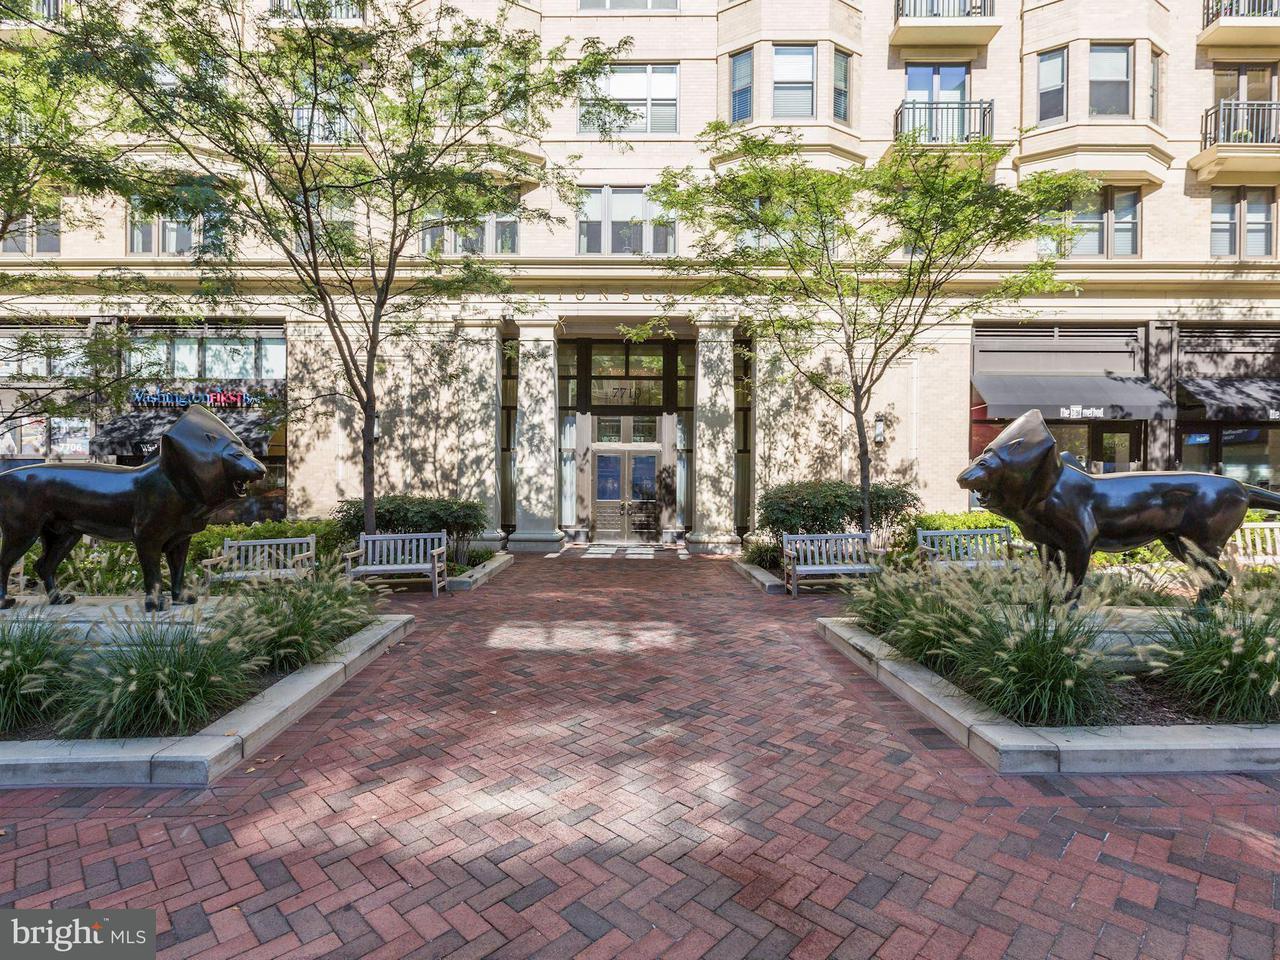 Condominium for Sale at 7710 Woodmont Ave #1211 7710 Woodmont Ave #1211 Bethesda, Maryland 20814 United States